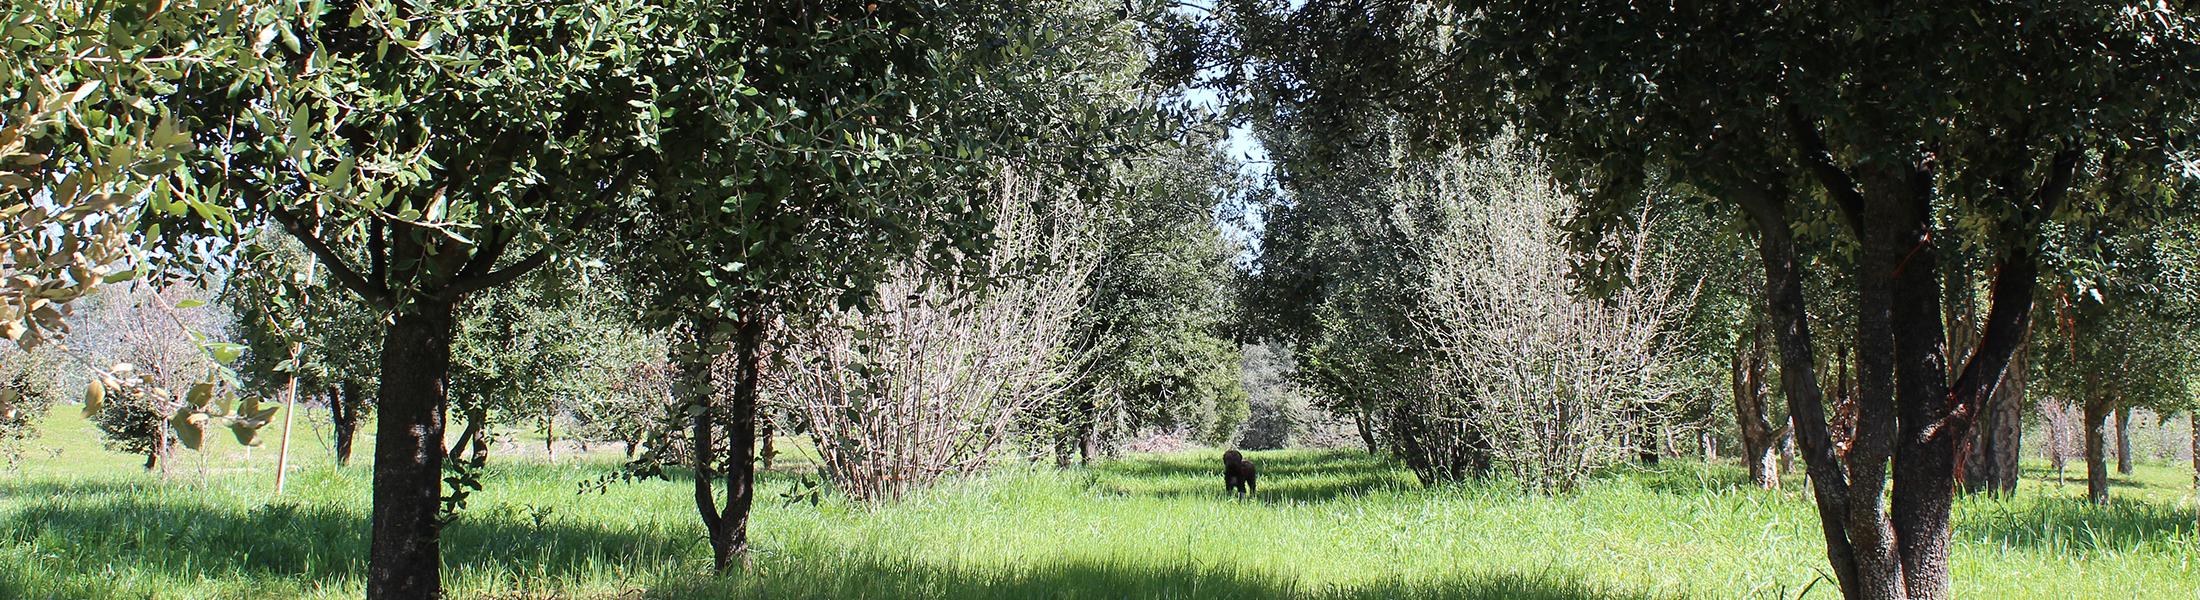 Tesoro Mio (Treasure of mine) is a producing truffle farm